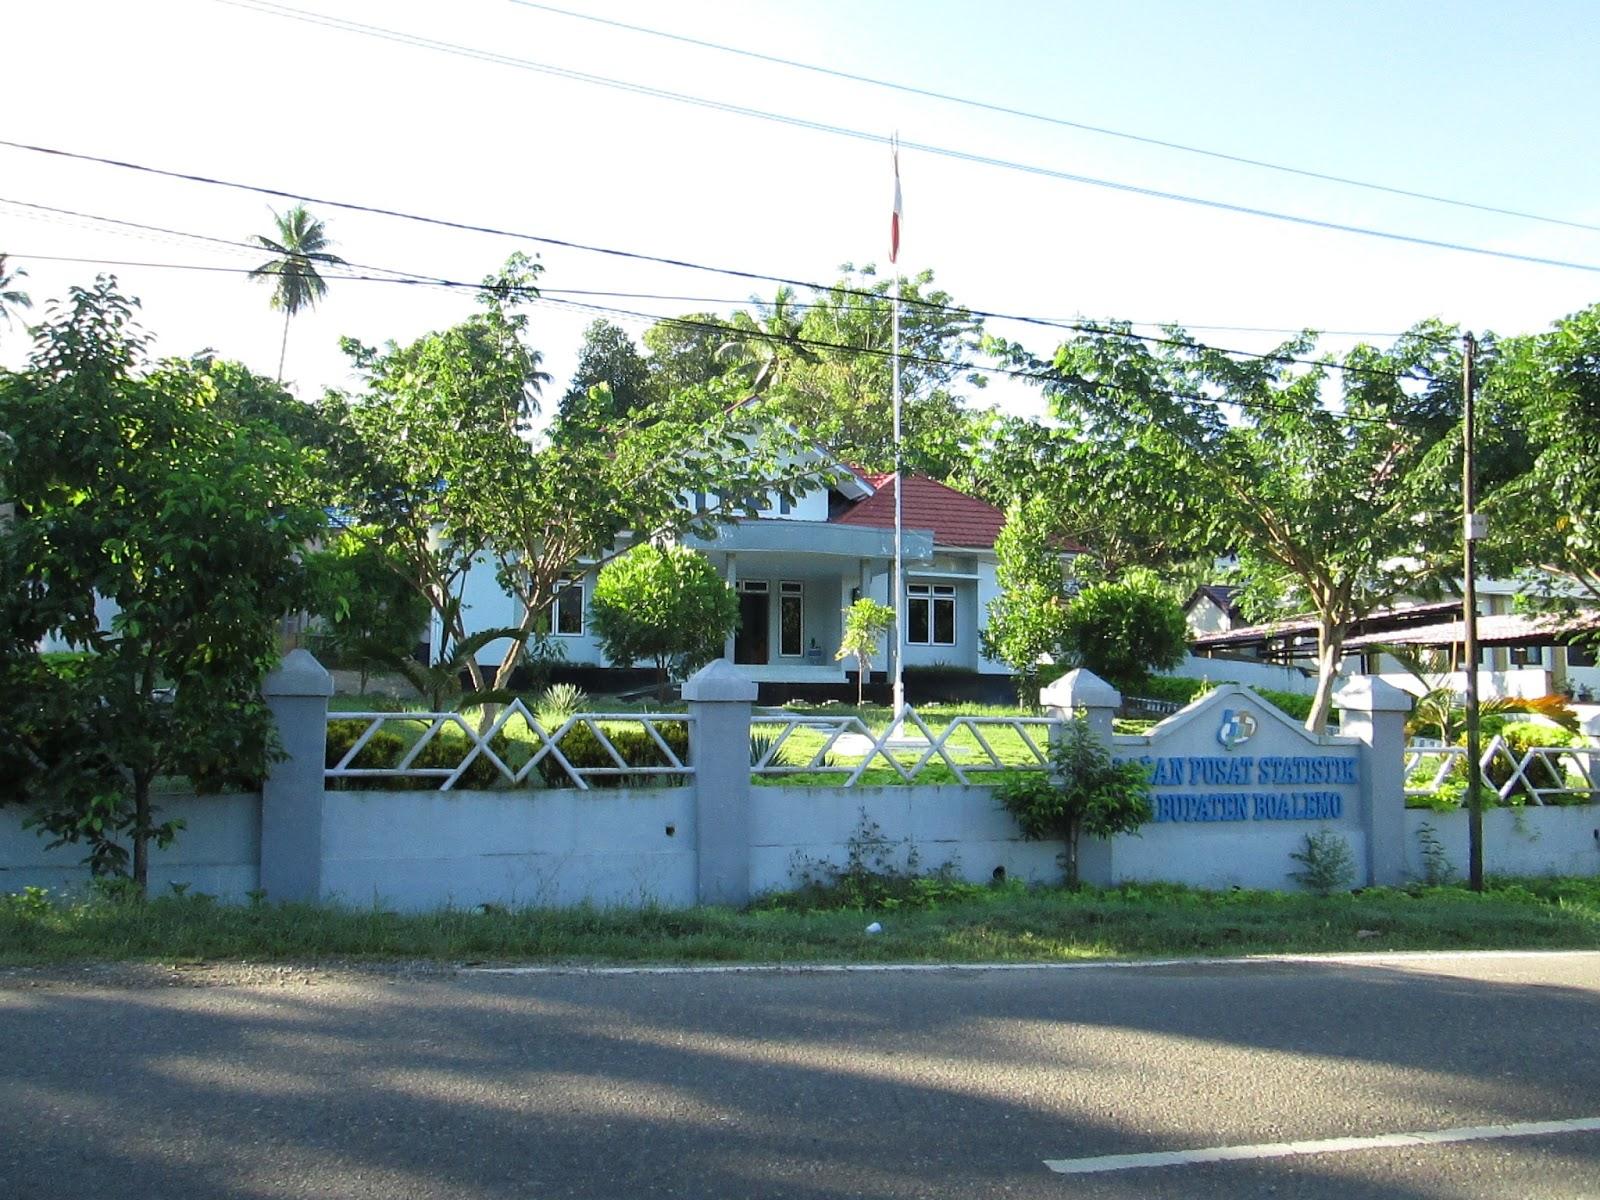 March 2013 Monice Family Office Badan Pusat Statistik Kabupaten Boalemo